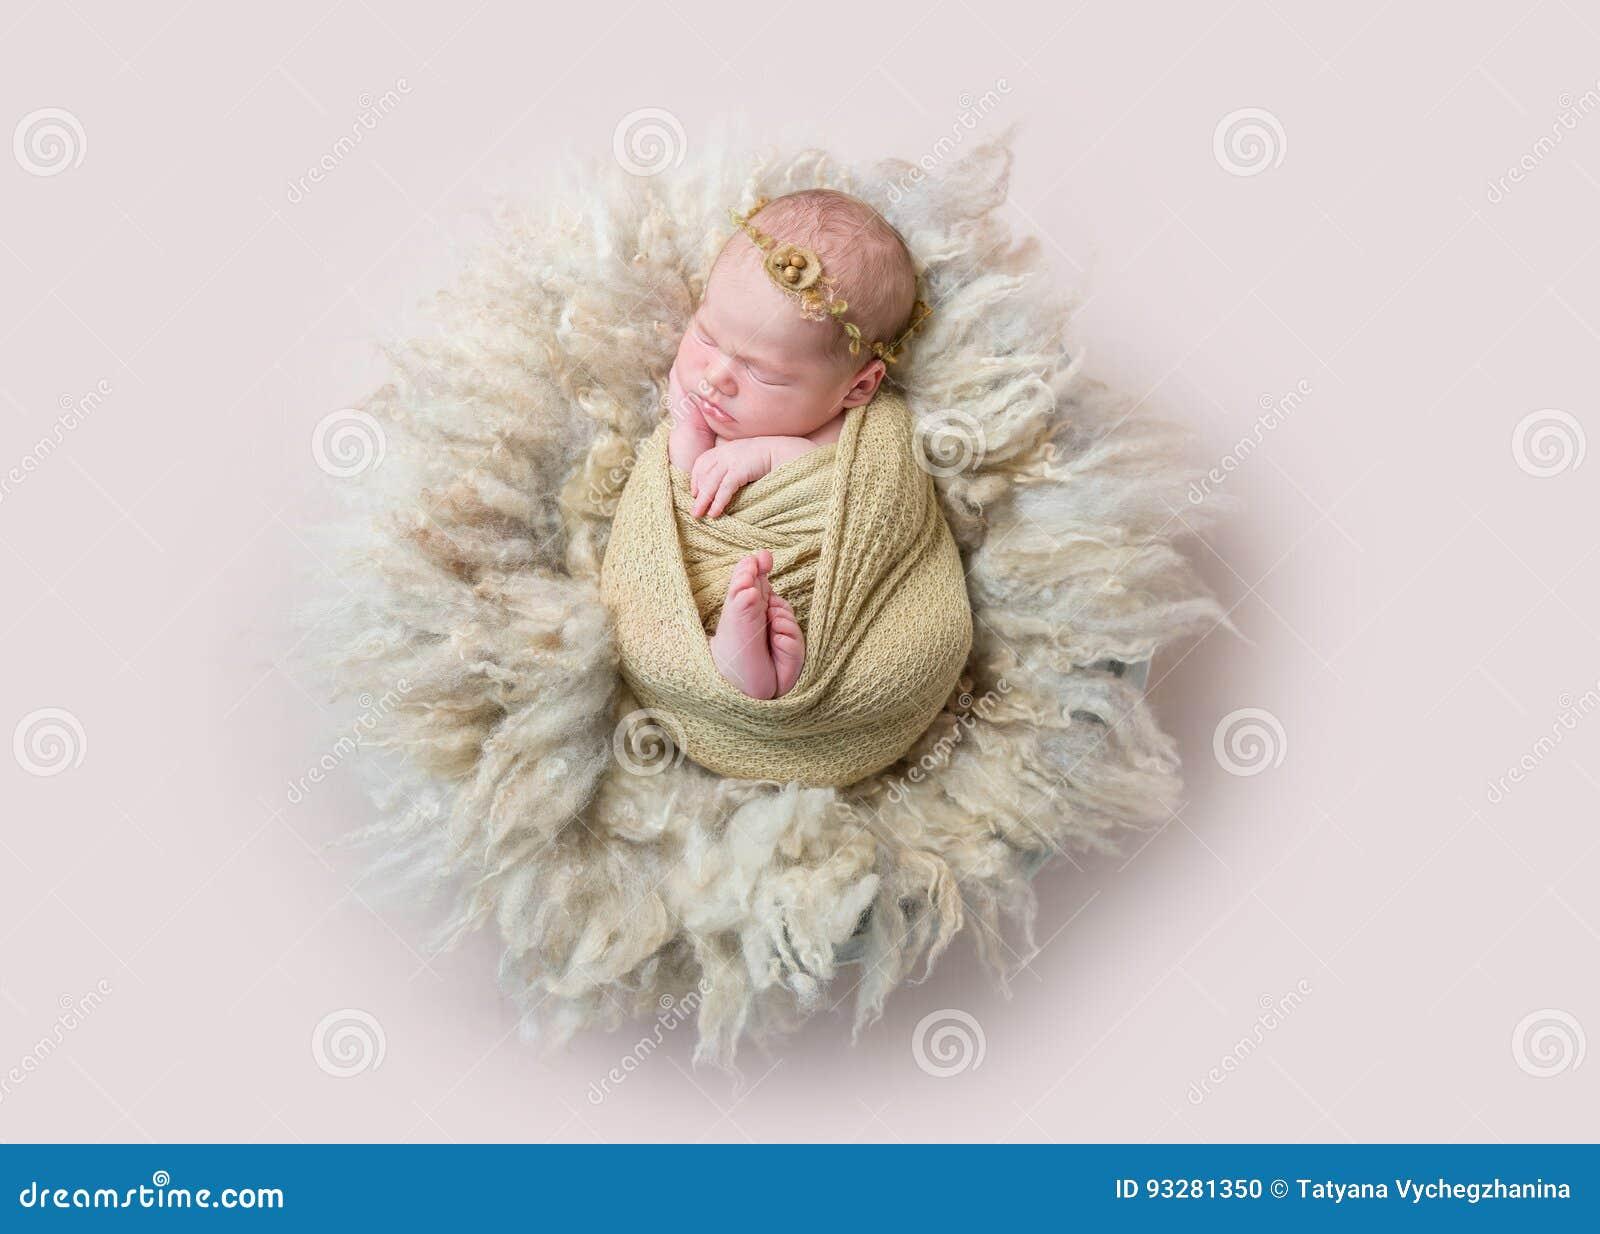 Спать младенца swaddled с игрушкой кролика, topview